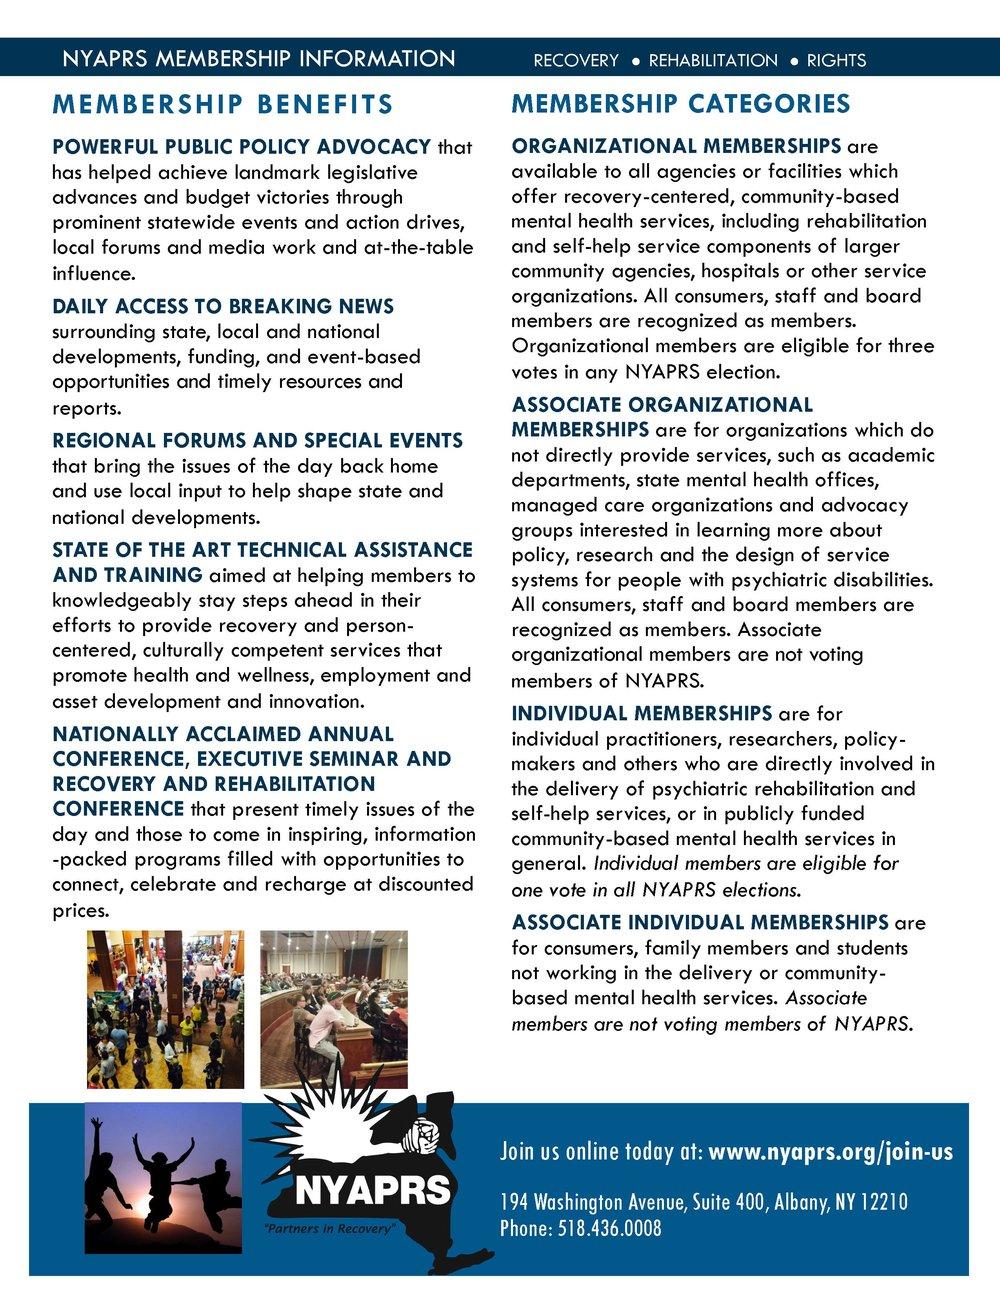 NYAPRS 2018 Executive Seminar Program-7.jpg